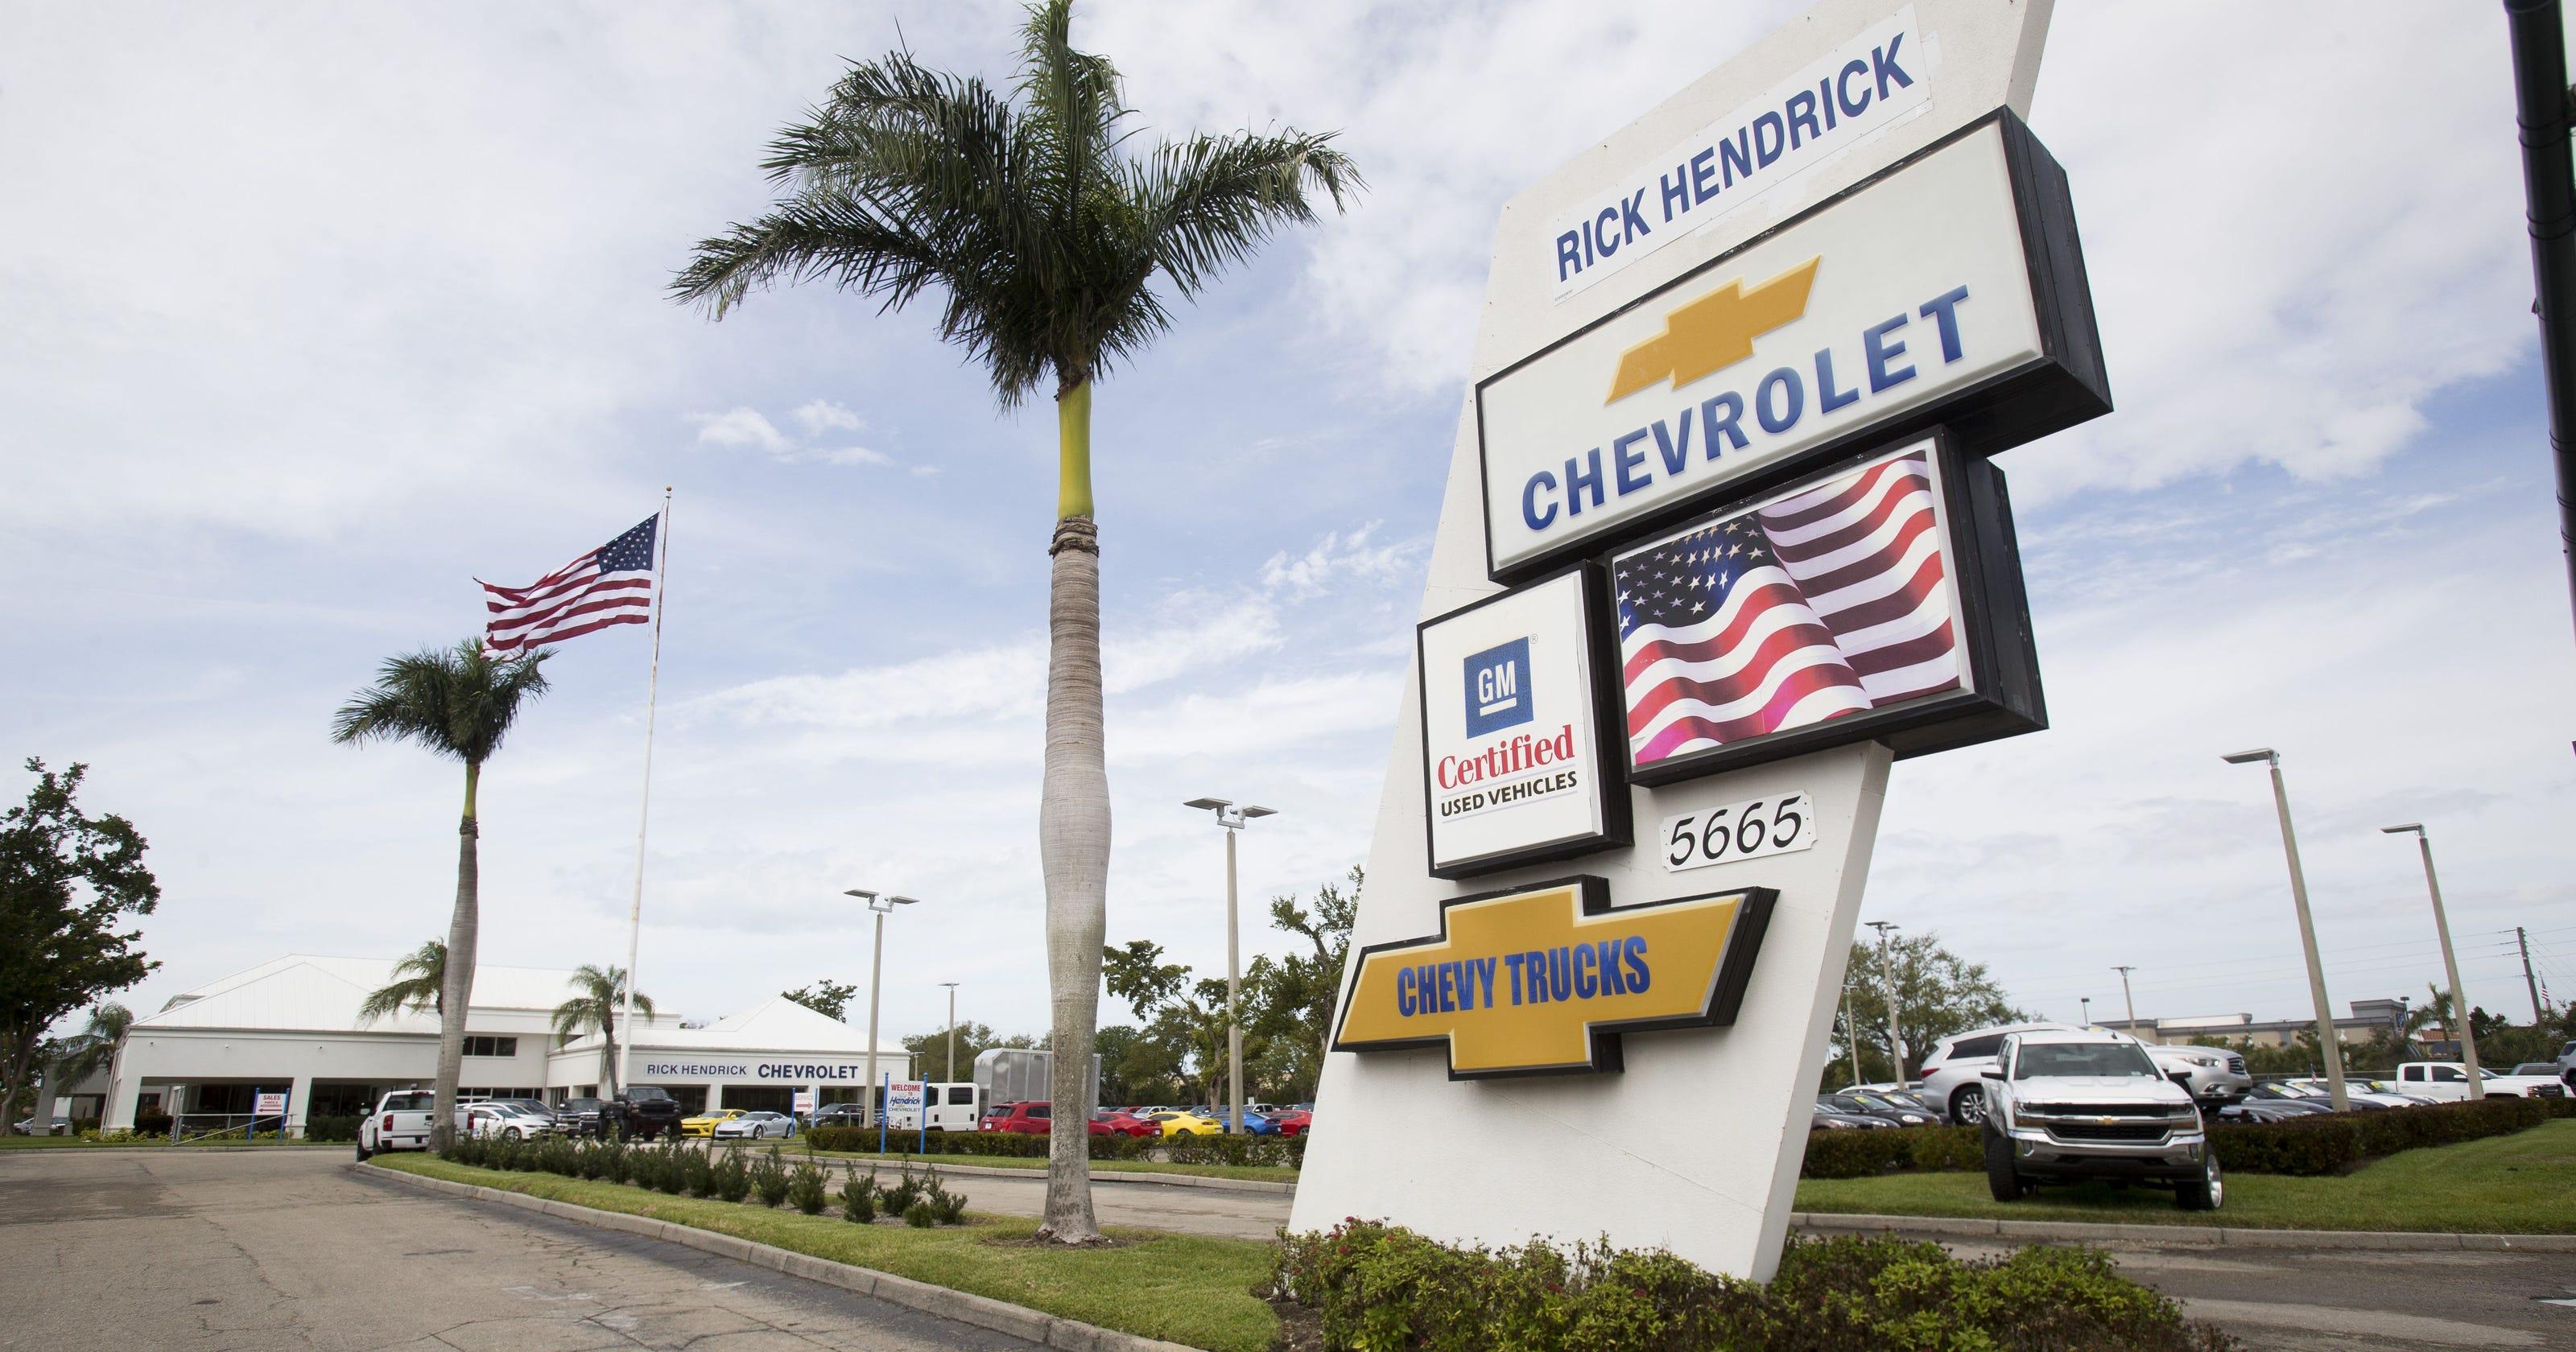 Rick Hendrick Chevrolet Naples Fleet trucks and vans